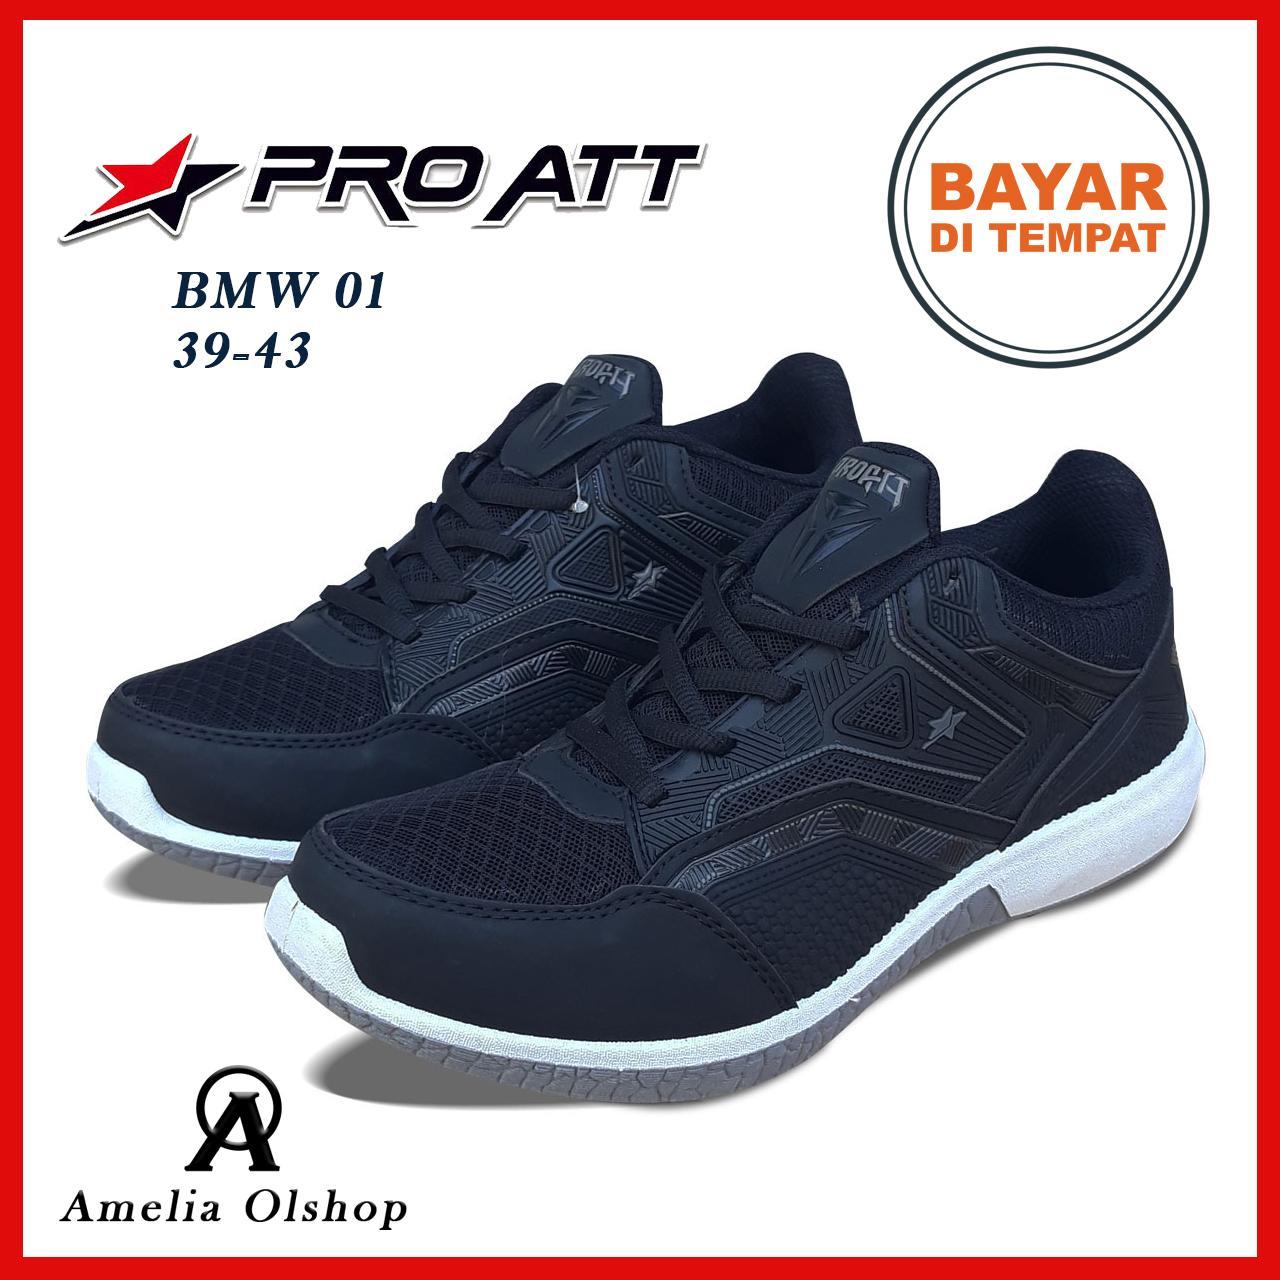 Amelia Olshop - Sepatu PRO ATT BMW 02 39-43   Sepatu Hitam   Sepatu 582c4b13a9